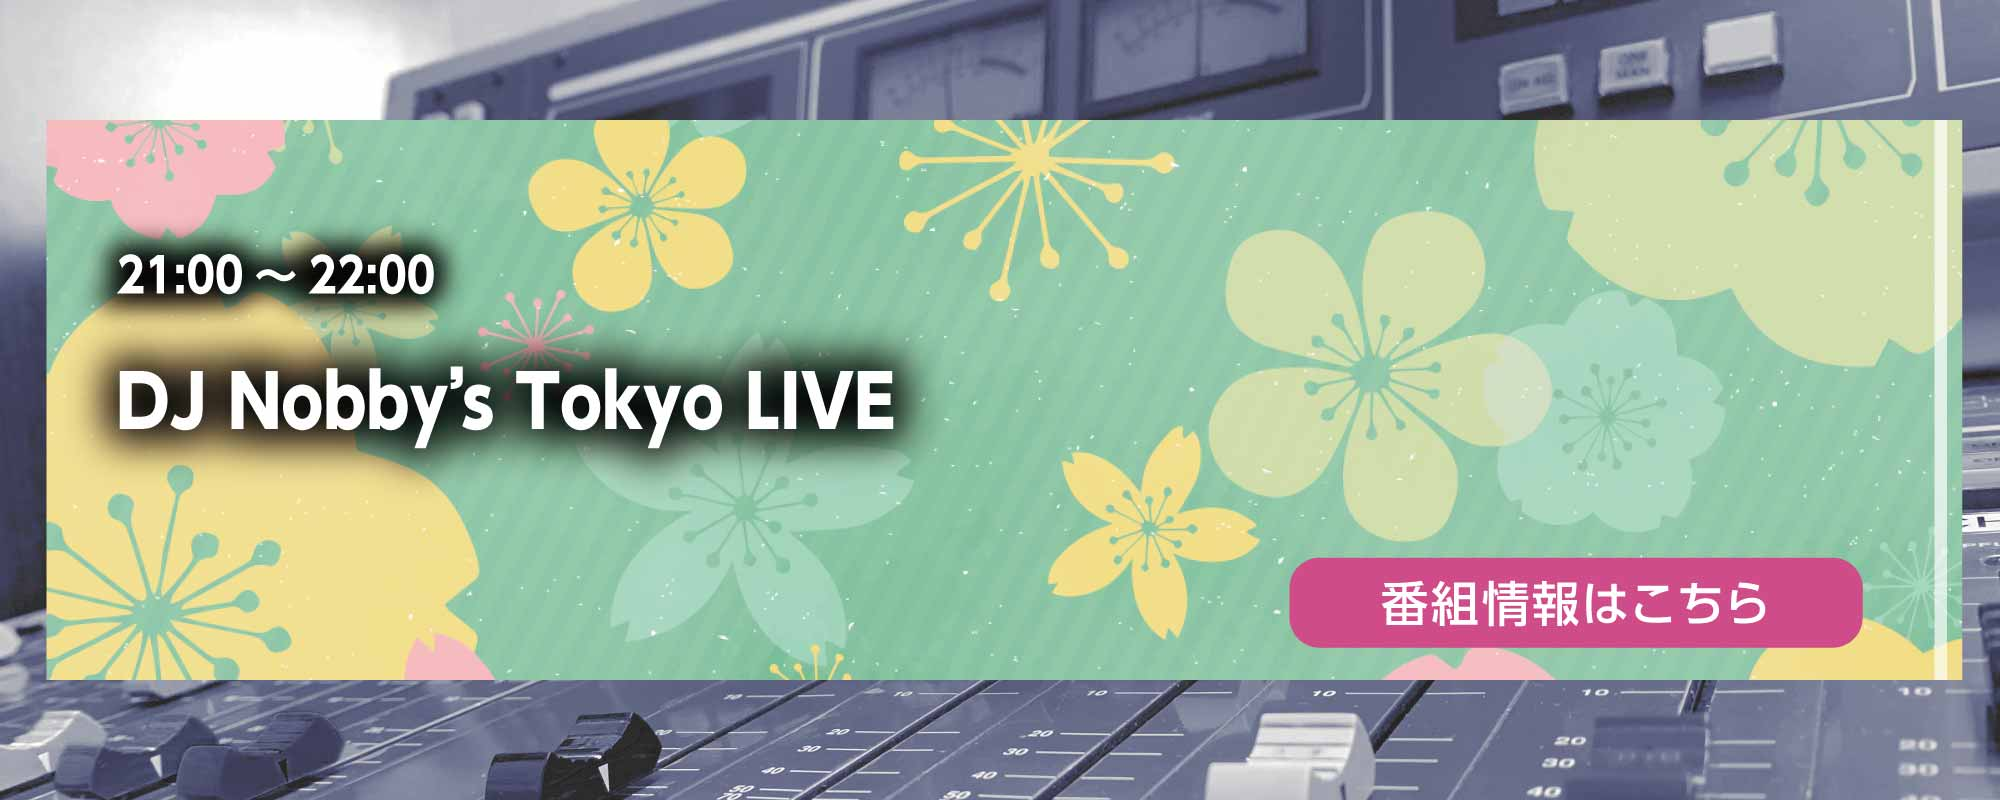 DJ Nobby's Tokyo LIVE